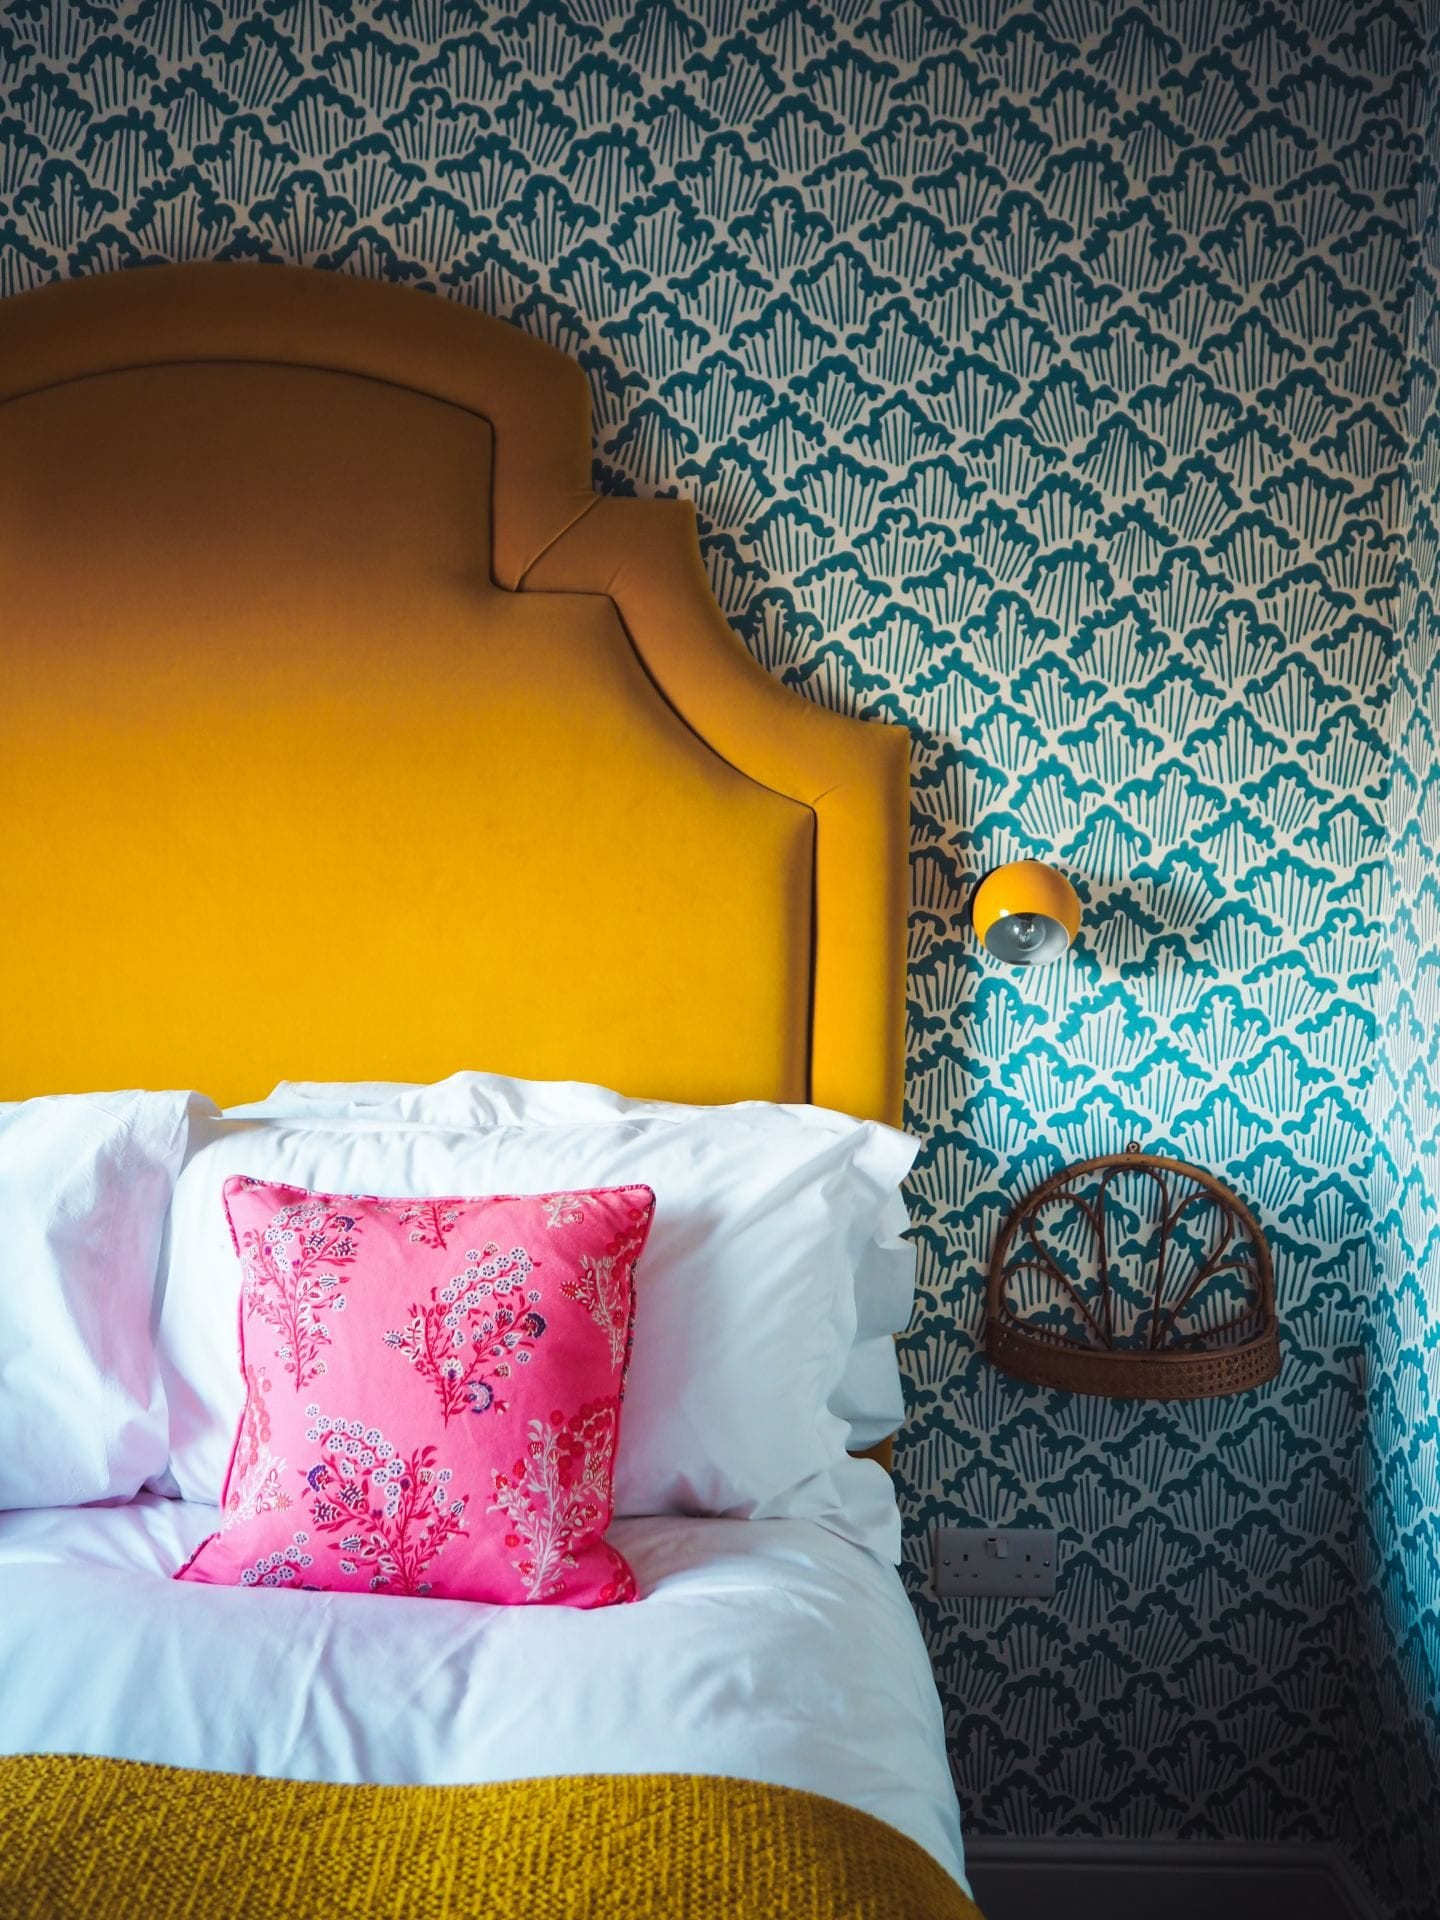 the rose deal kent decor interior design yellow headboard blue print wallpaper